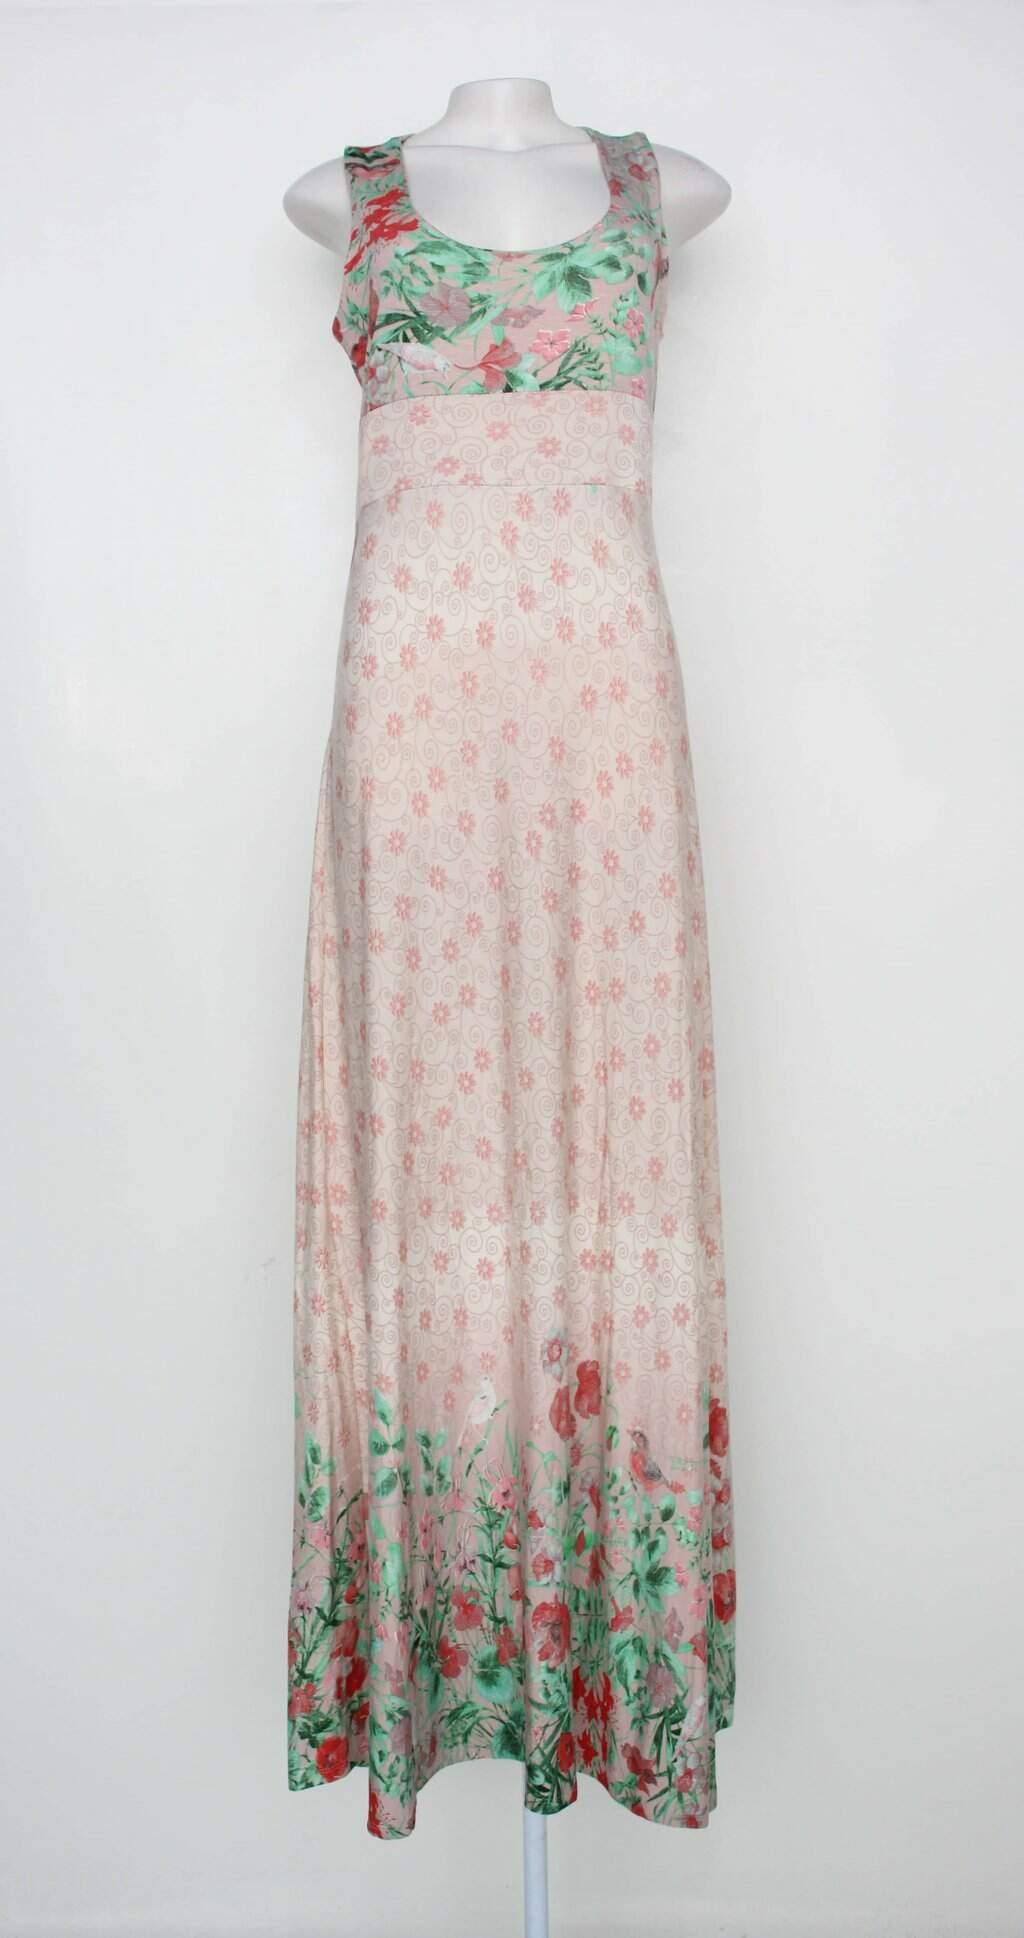 Vestido Longo Estampado Suzana Braun